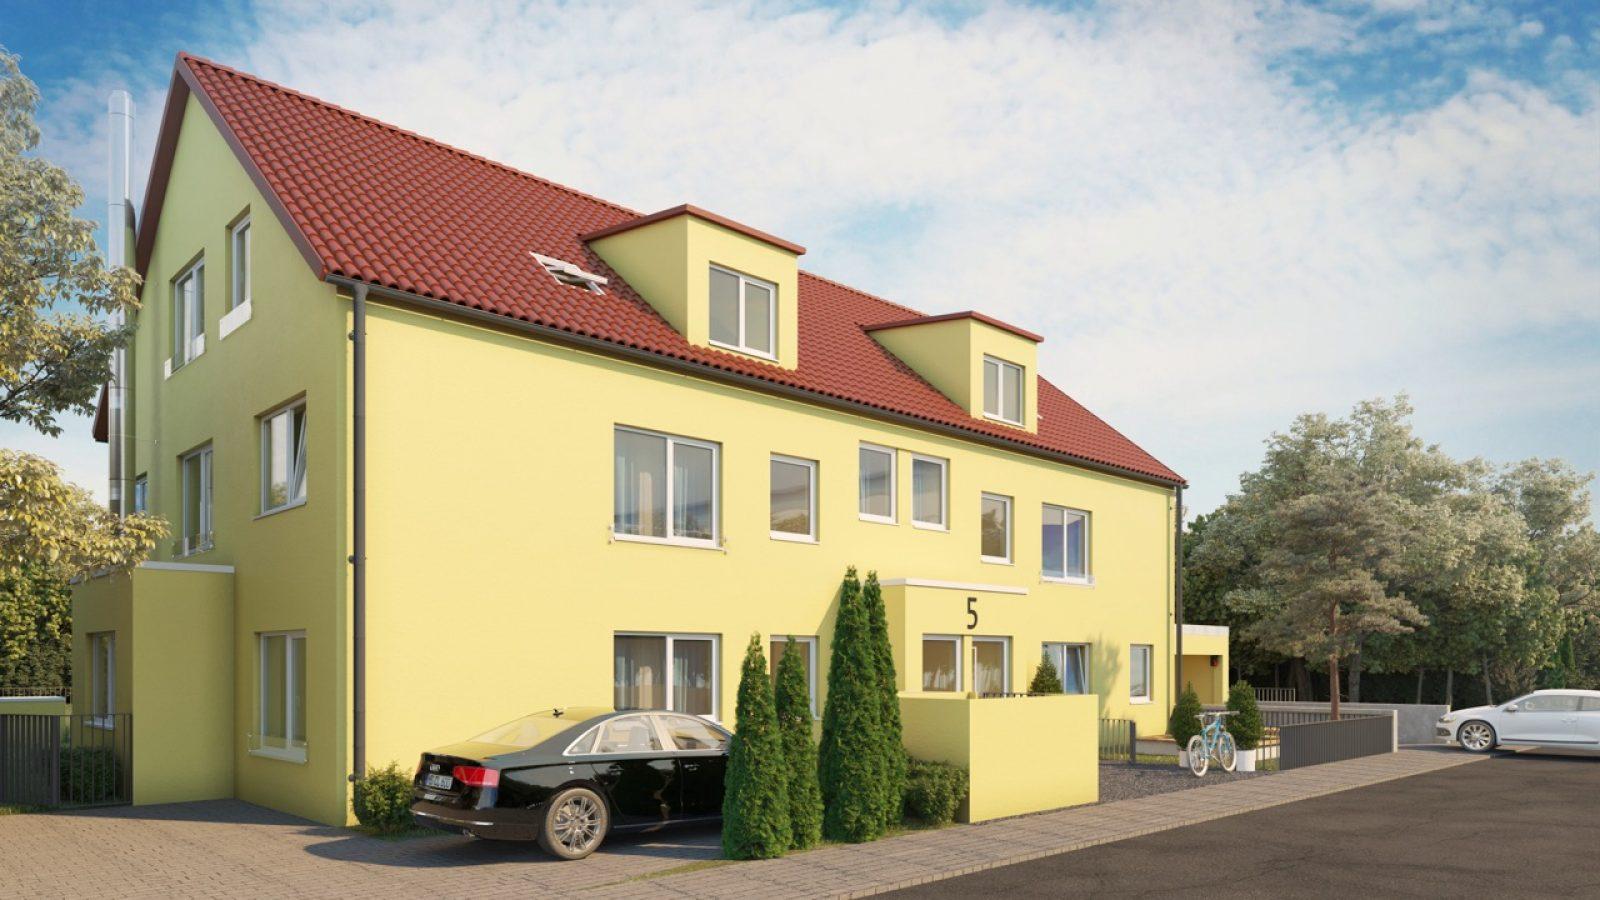 KRO_001_NP_Rieglerstrasse 13 Ingolstadt_0001_Post_4000x2250 (1)